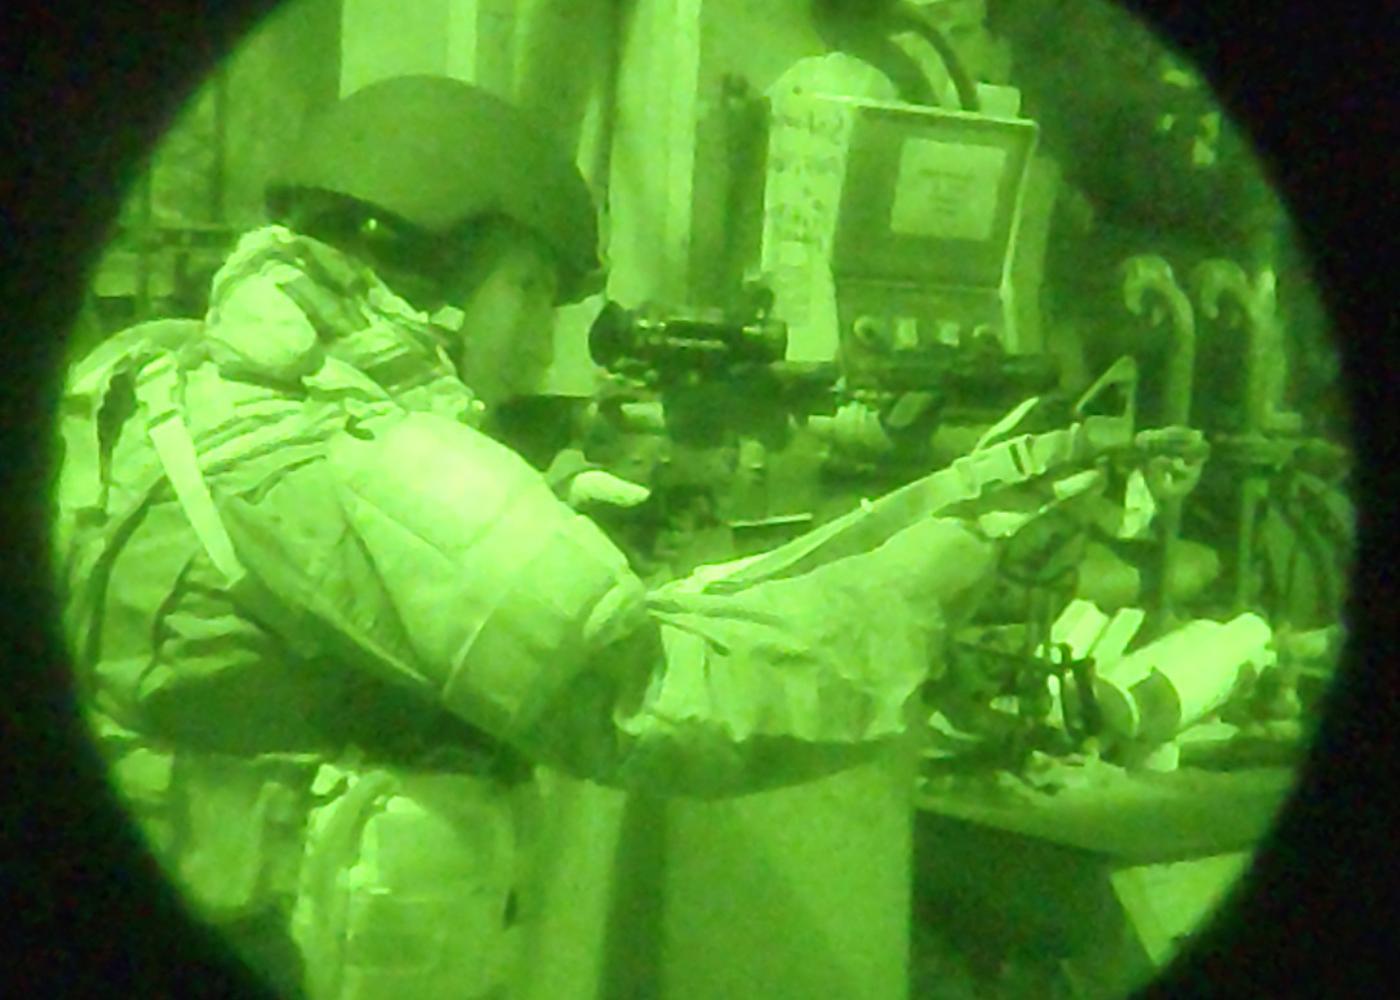 ARMASIGHT MNVD-51 Night Vision 2+ High